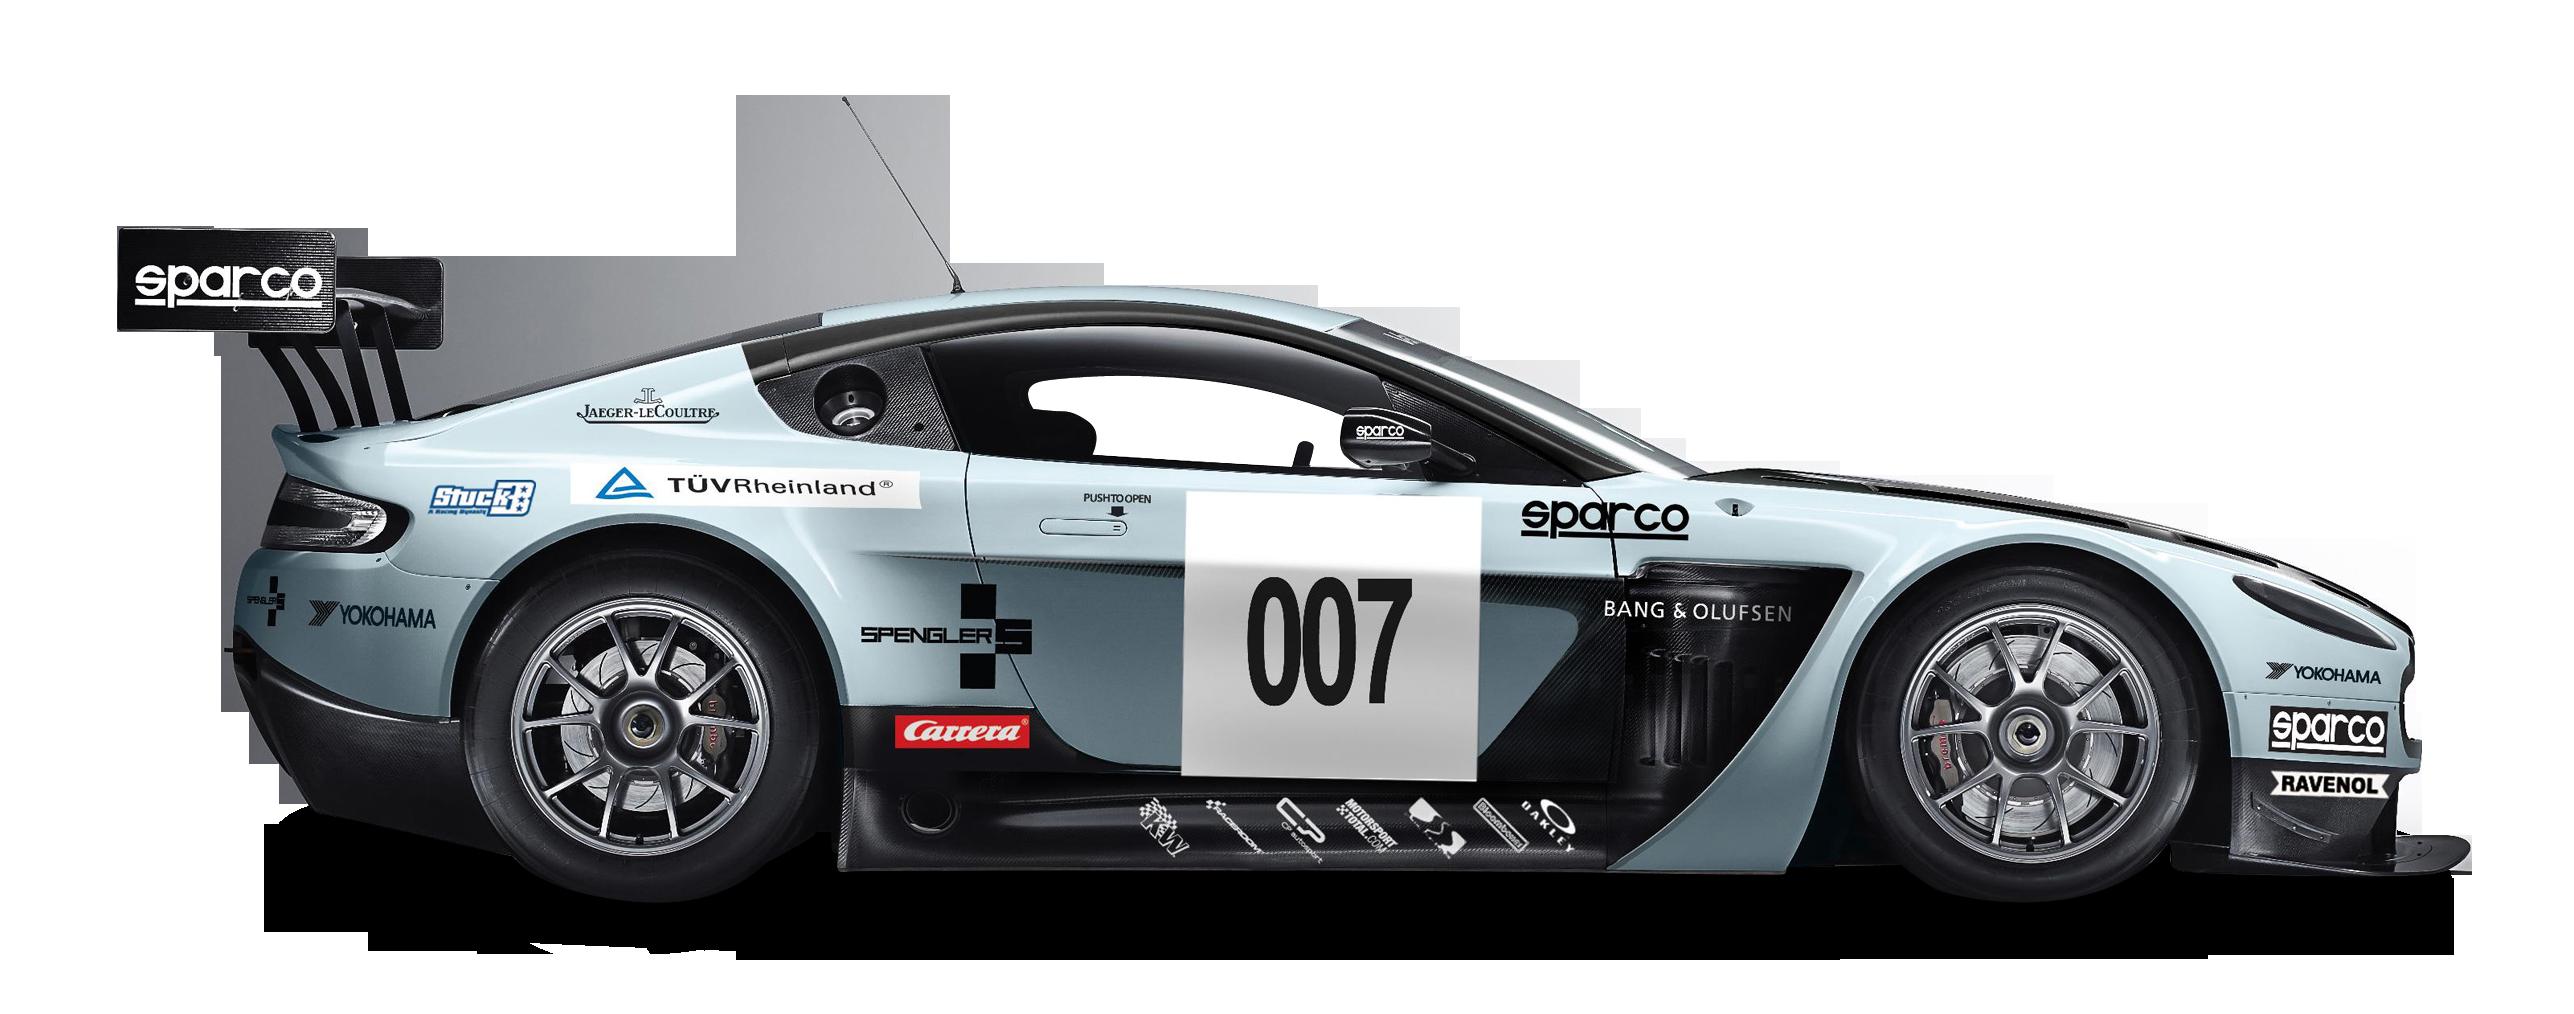 Blue Aston Martin Vantage GT3 Car PNG Image